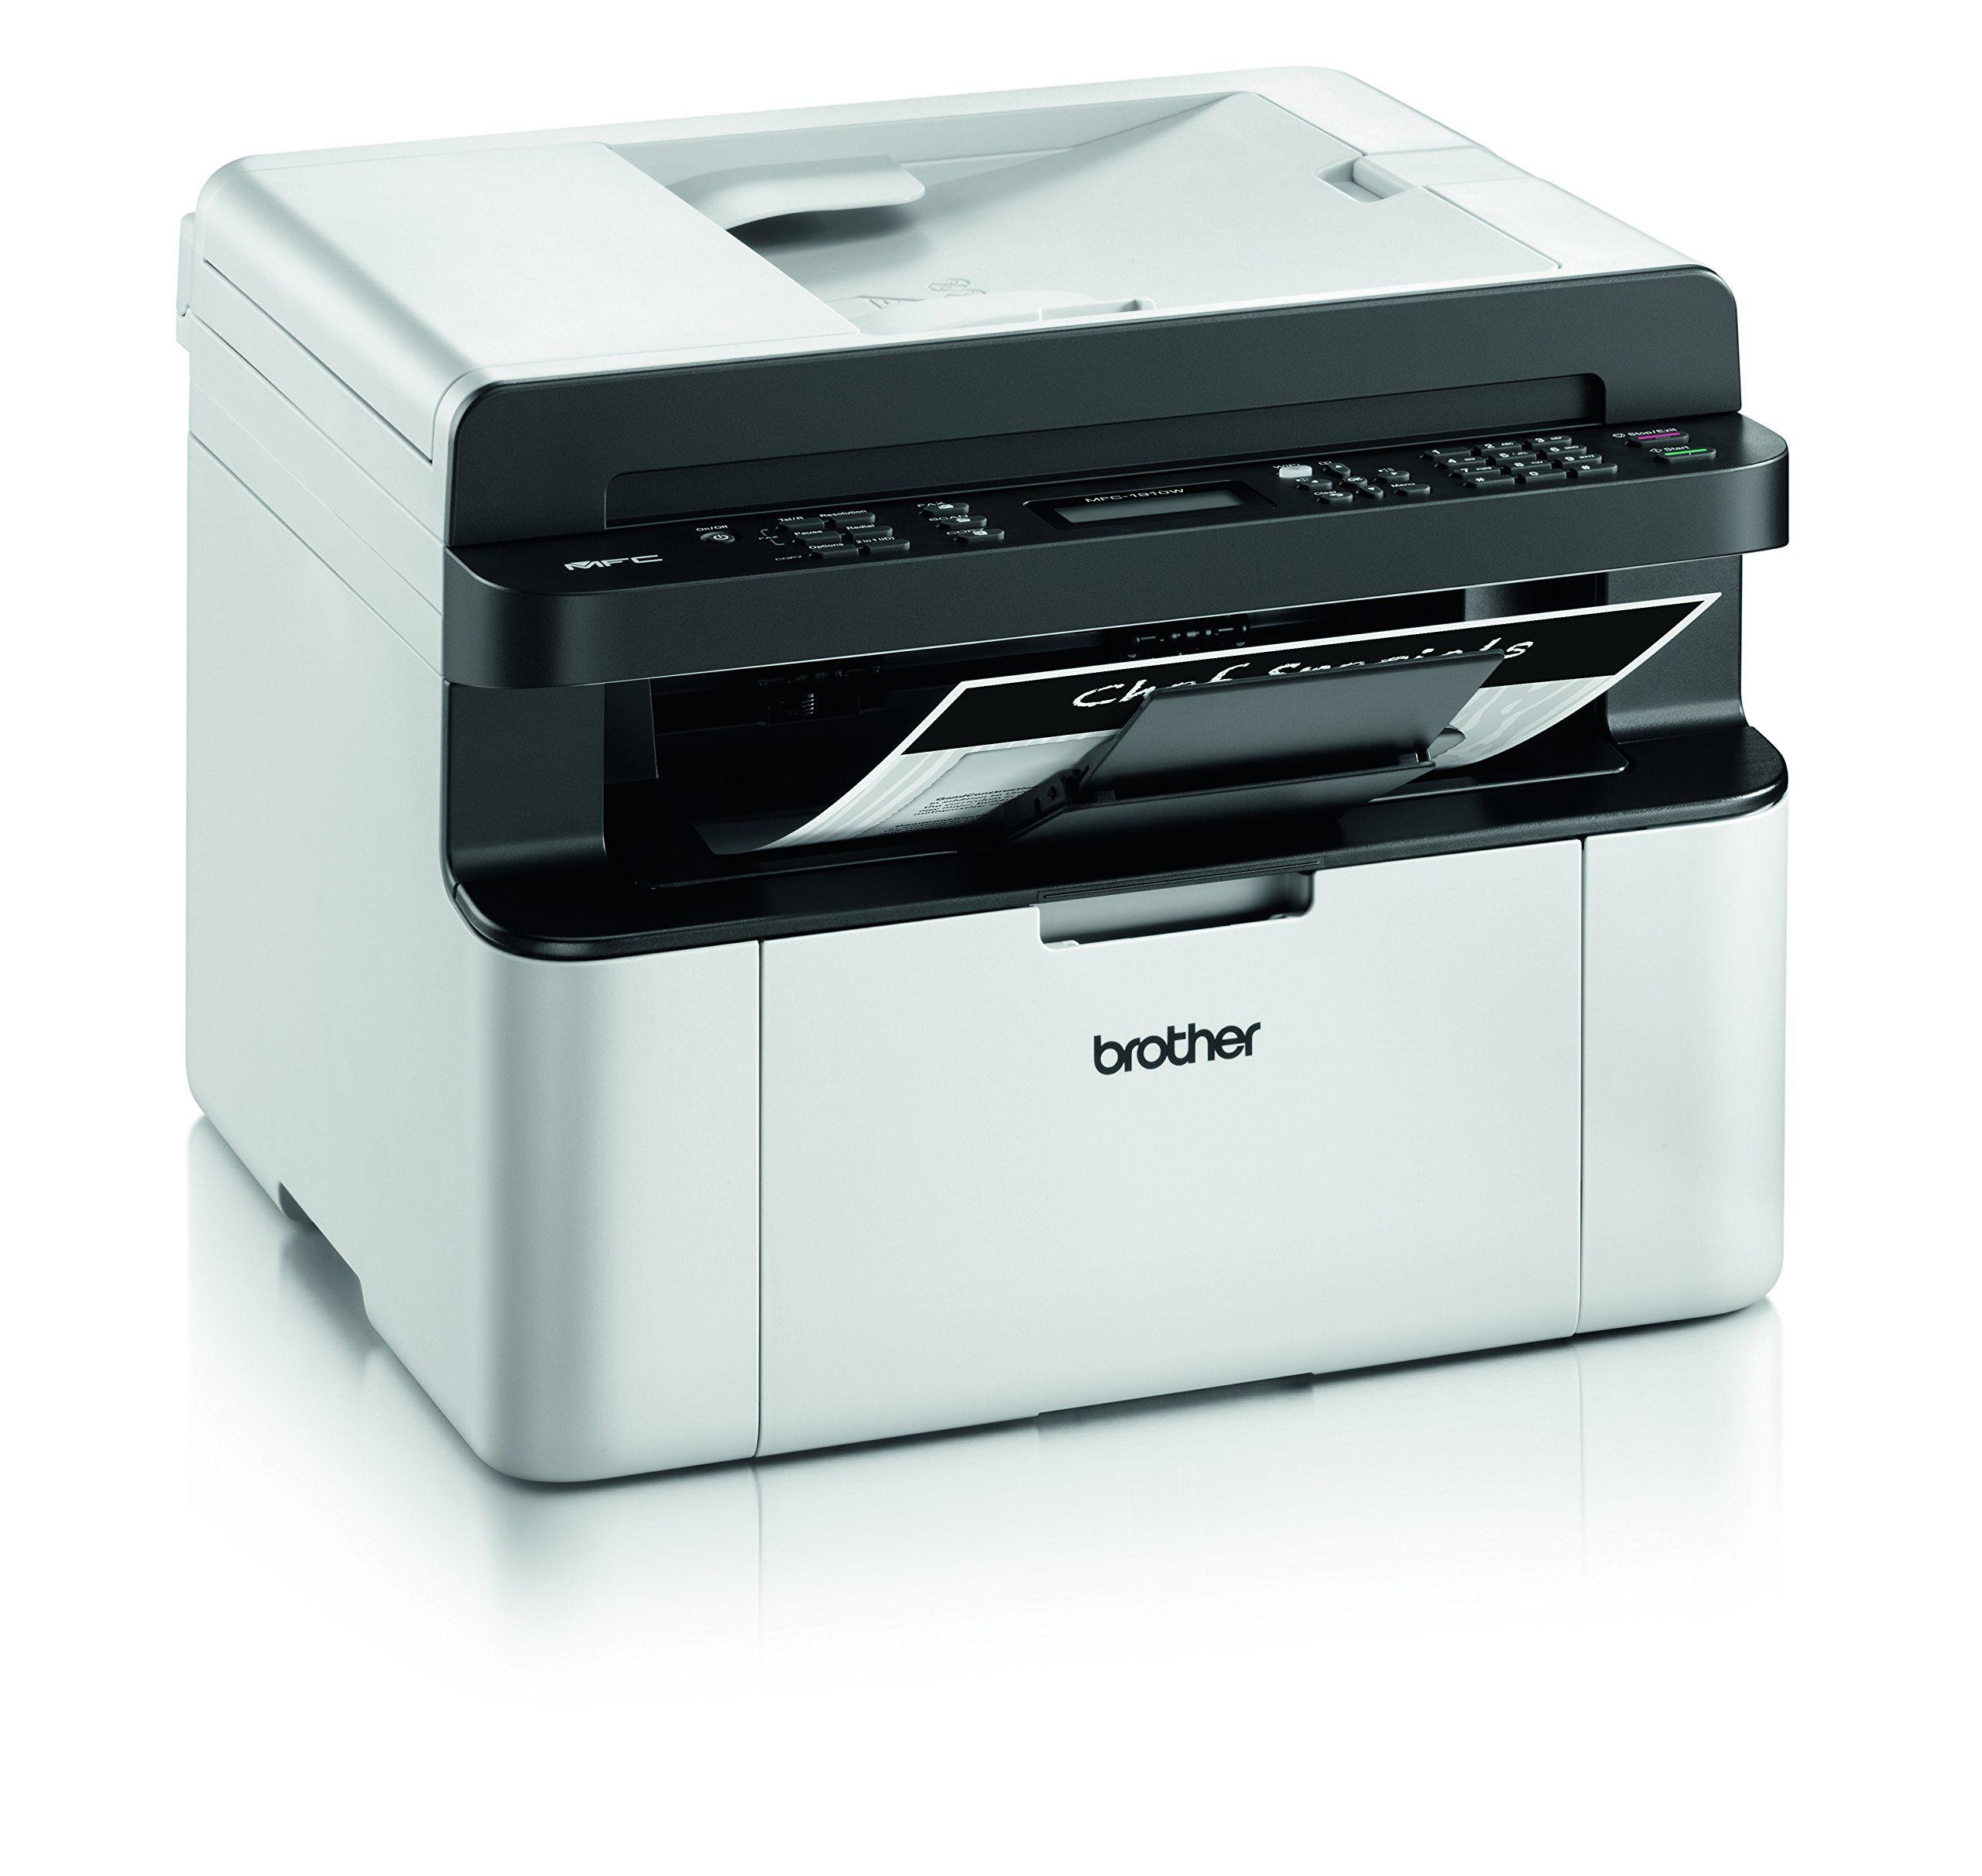 132 Brother Mfc1910w Impresora Laser Multifuncion 20 Ppm